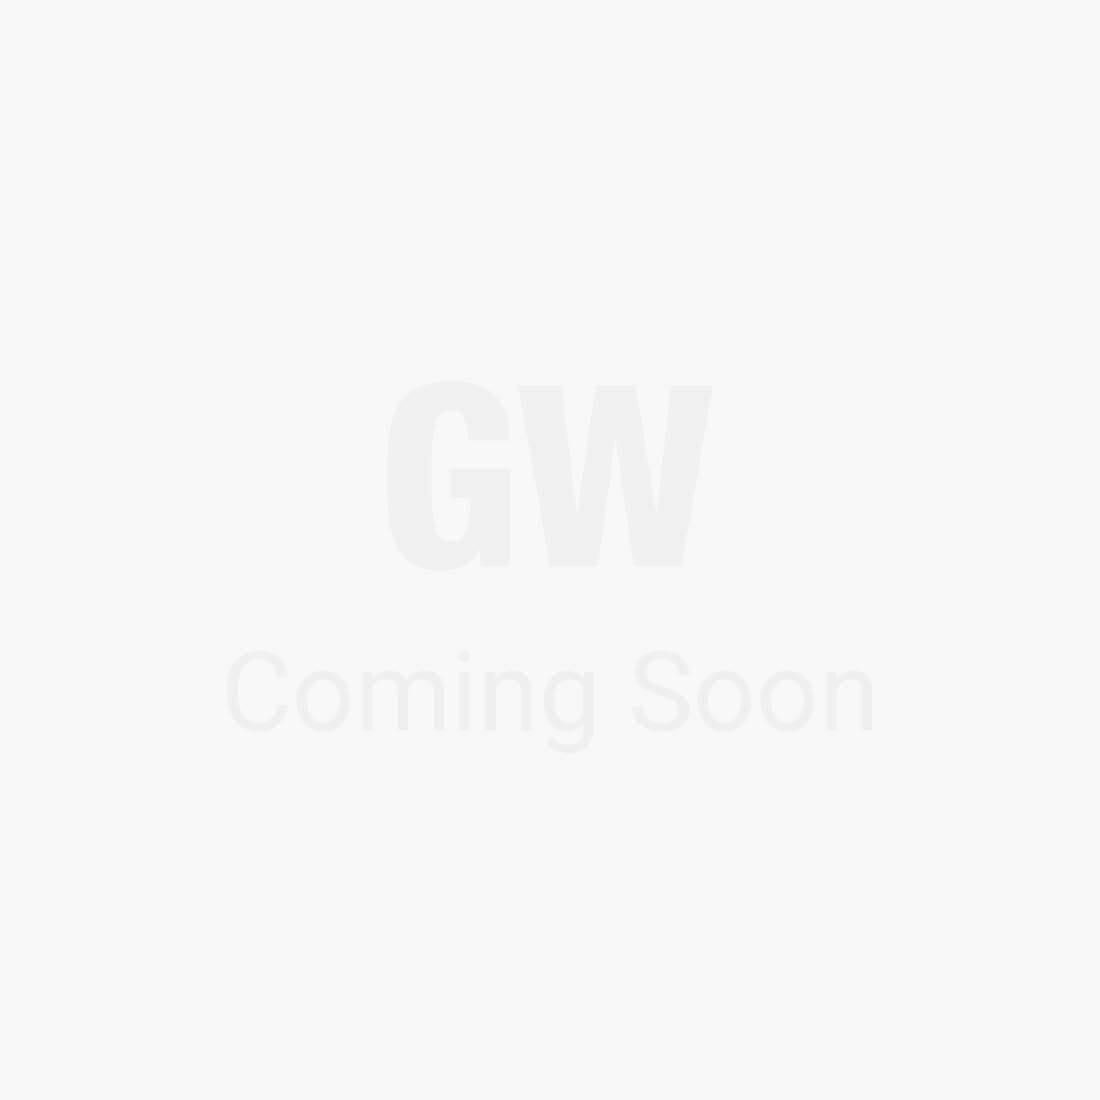 Eloise Dining Chair